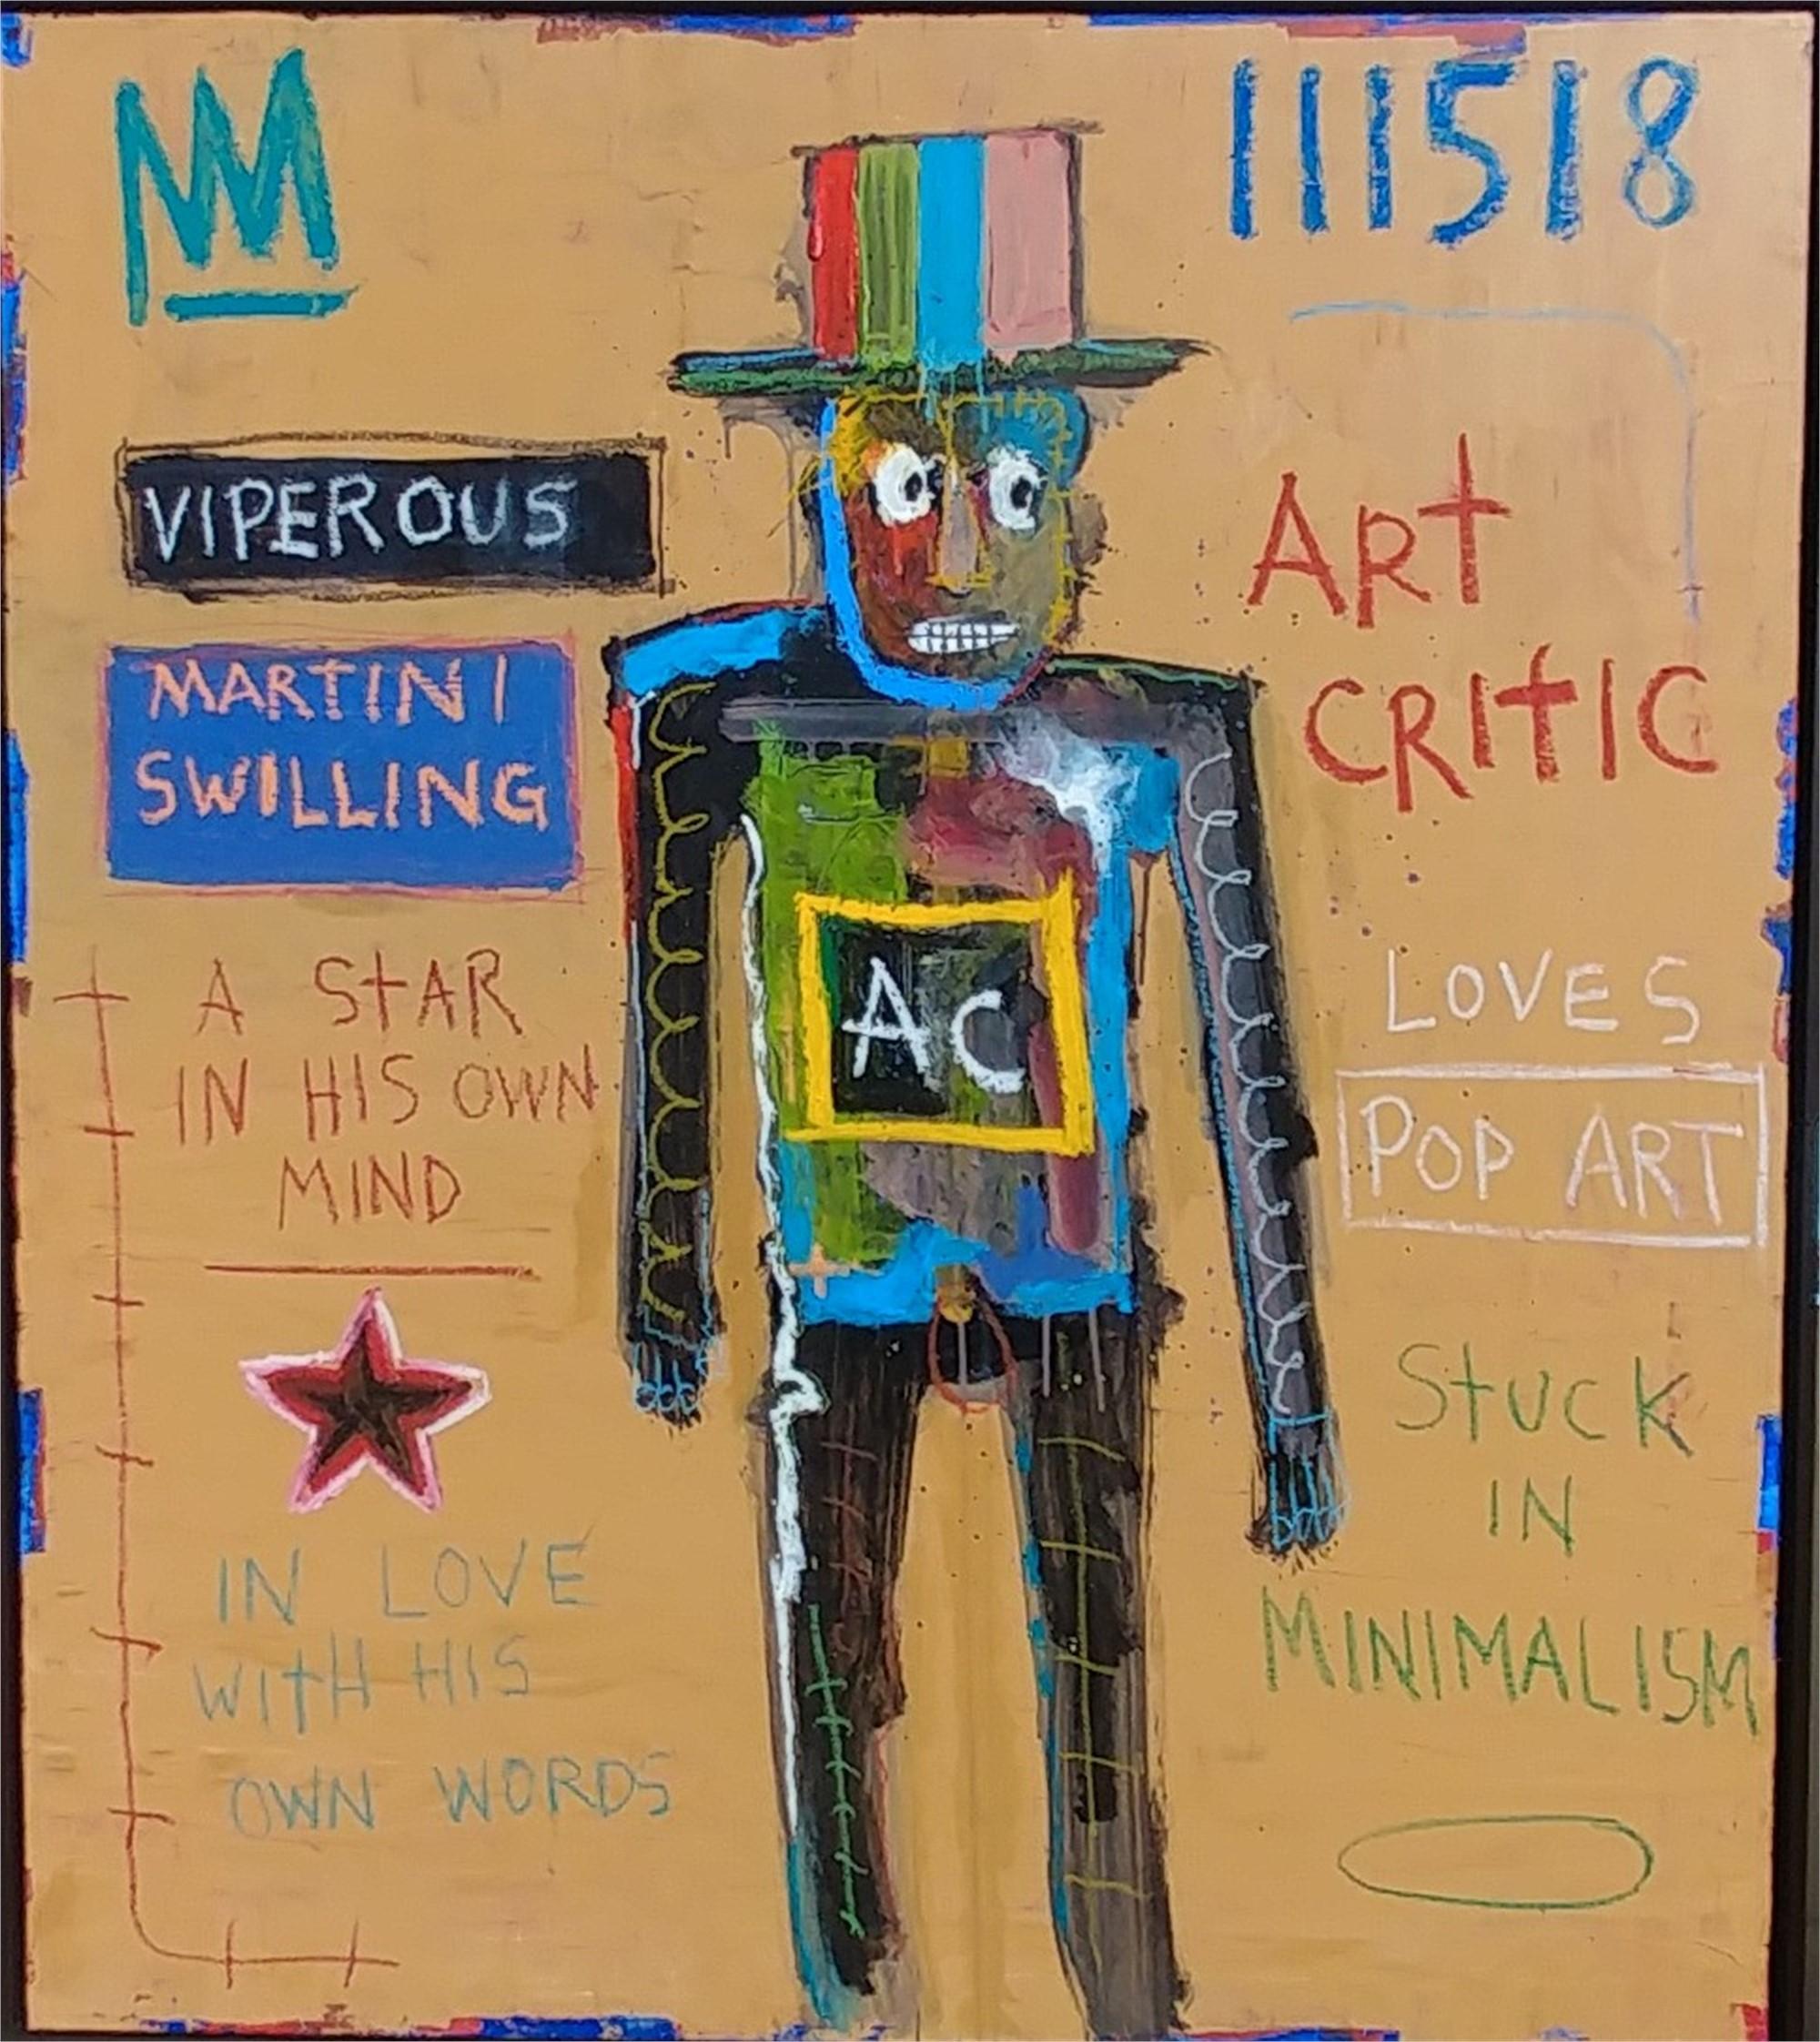 Viperous, Martini Swilling Art Critic by Michael Snodgrass